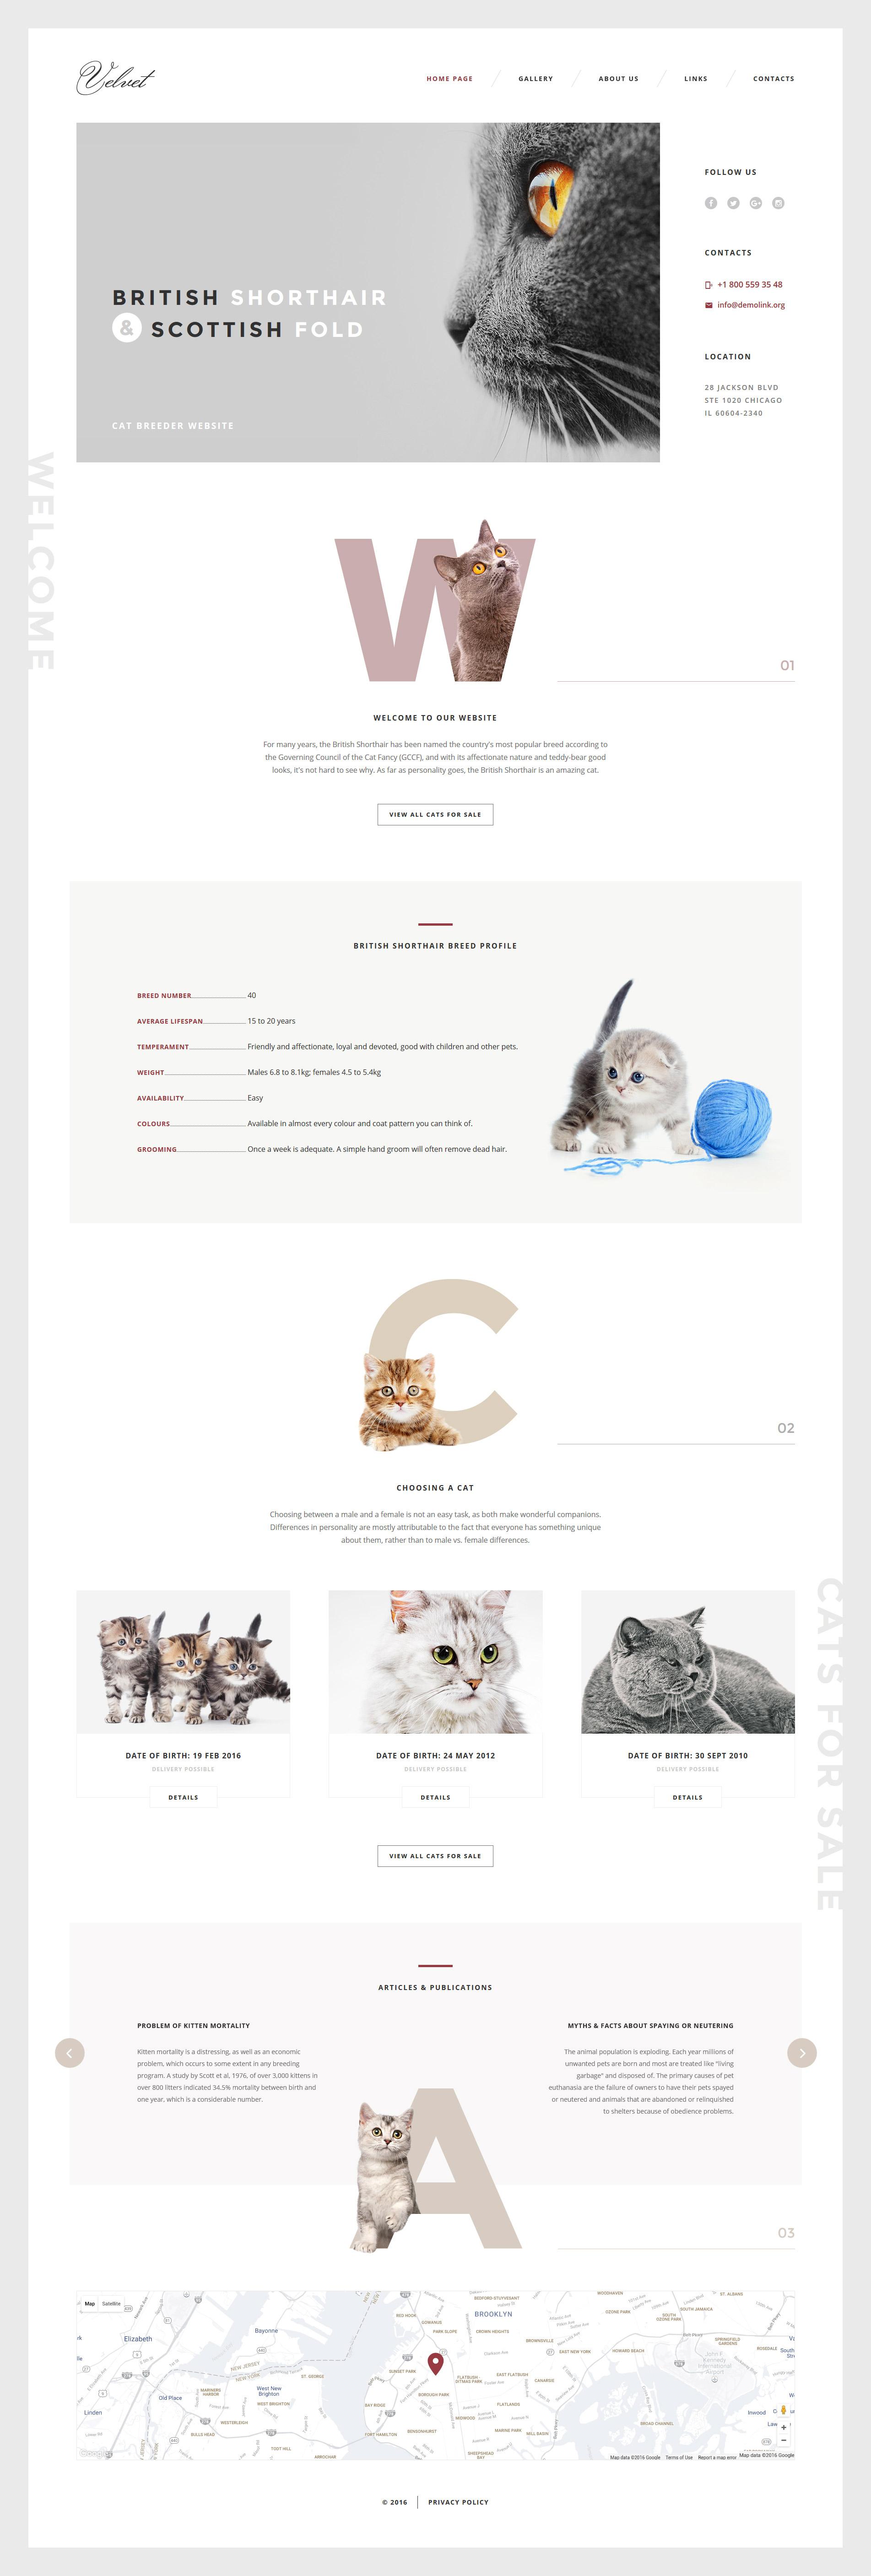 Адаптивный HTML шаблон №58574 на тему кошки